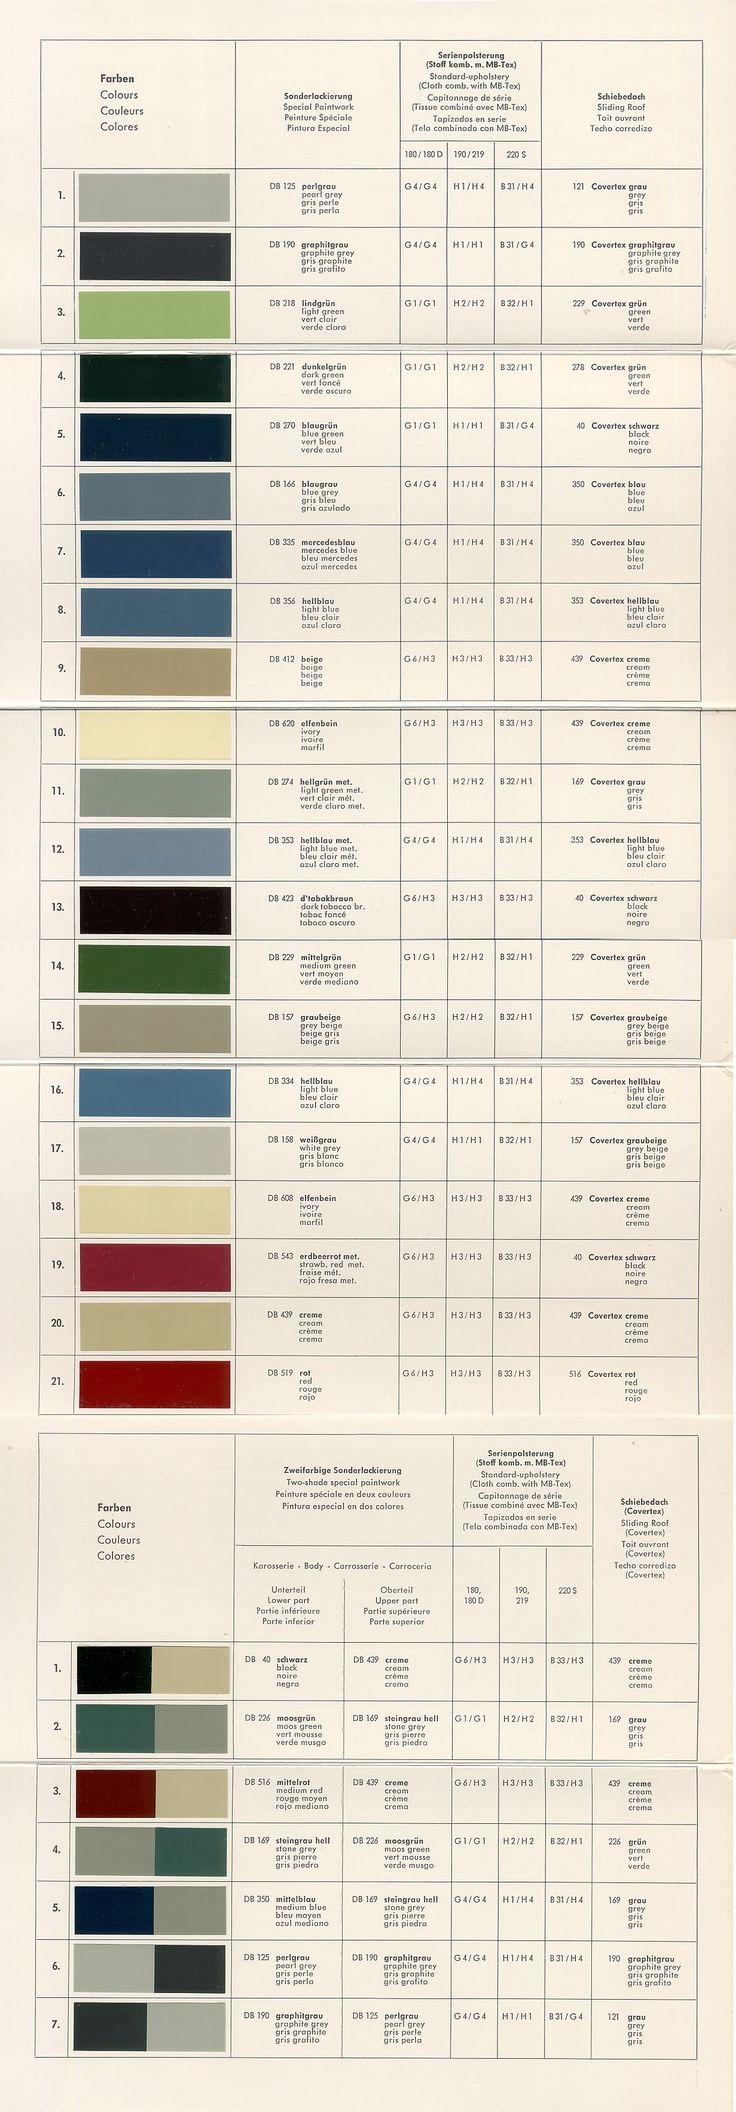 190SL MB Ponton Paint Codes